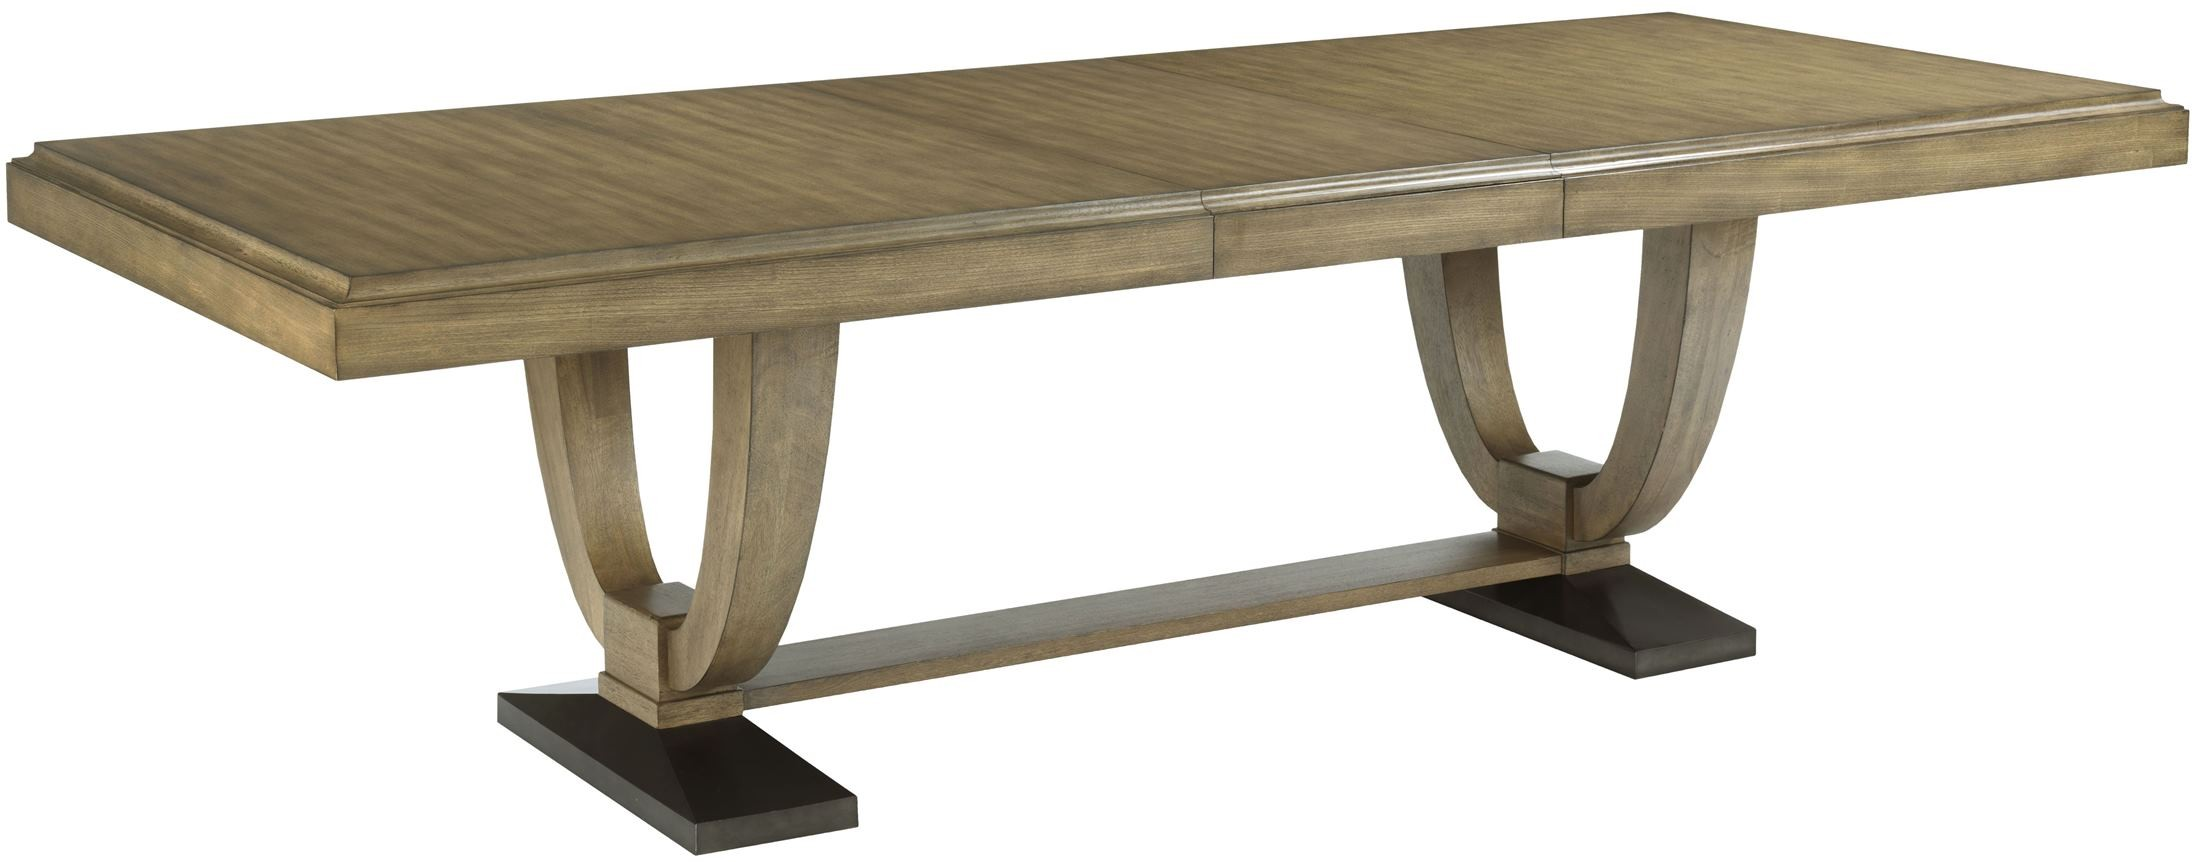 Evoke Barley Trestle Extendable Dining Table 509 760R  : 509 760wleaves from colemanfurniture.com size 2200 x 862 jpeg 163kB